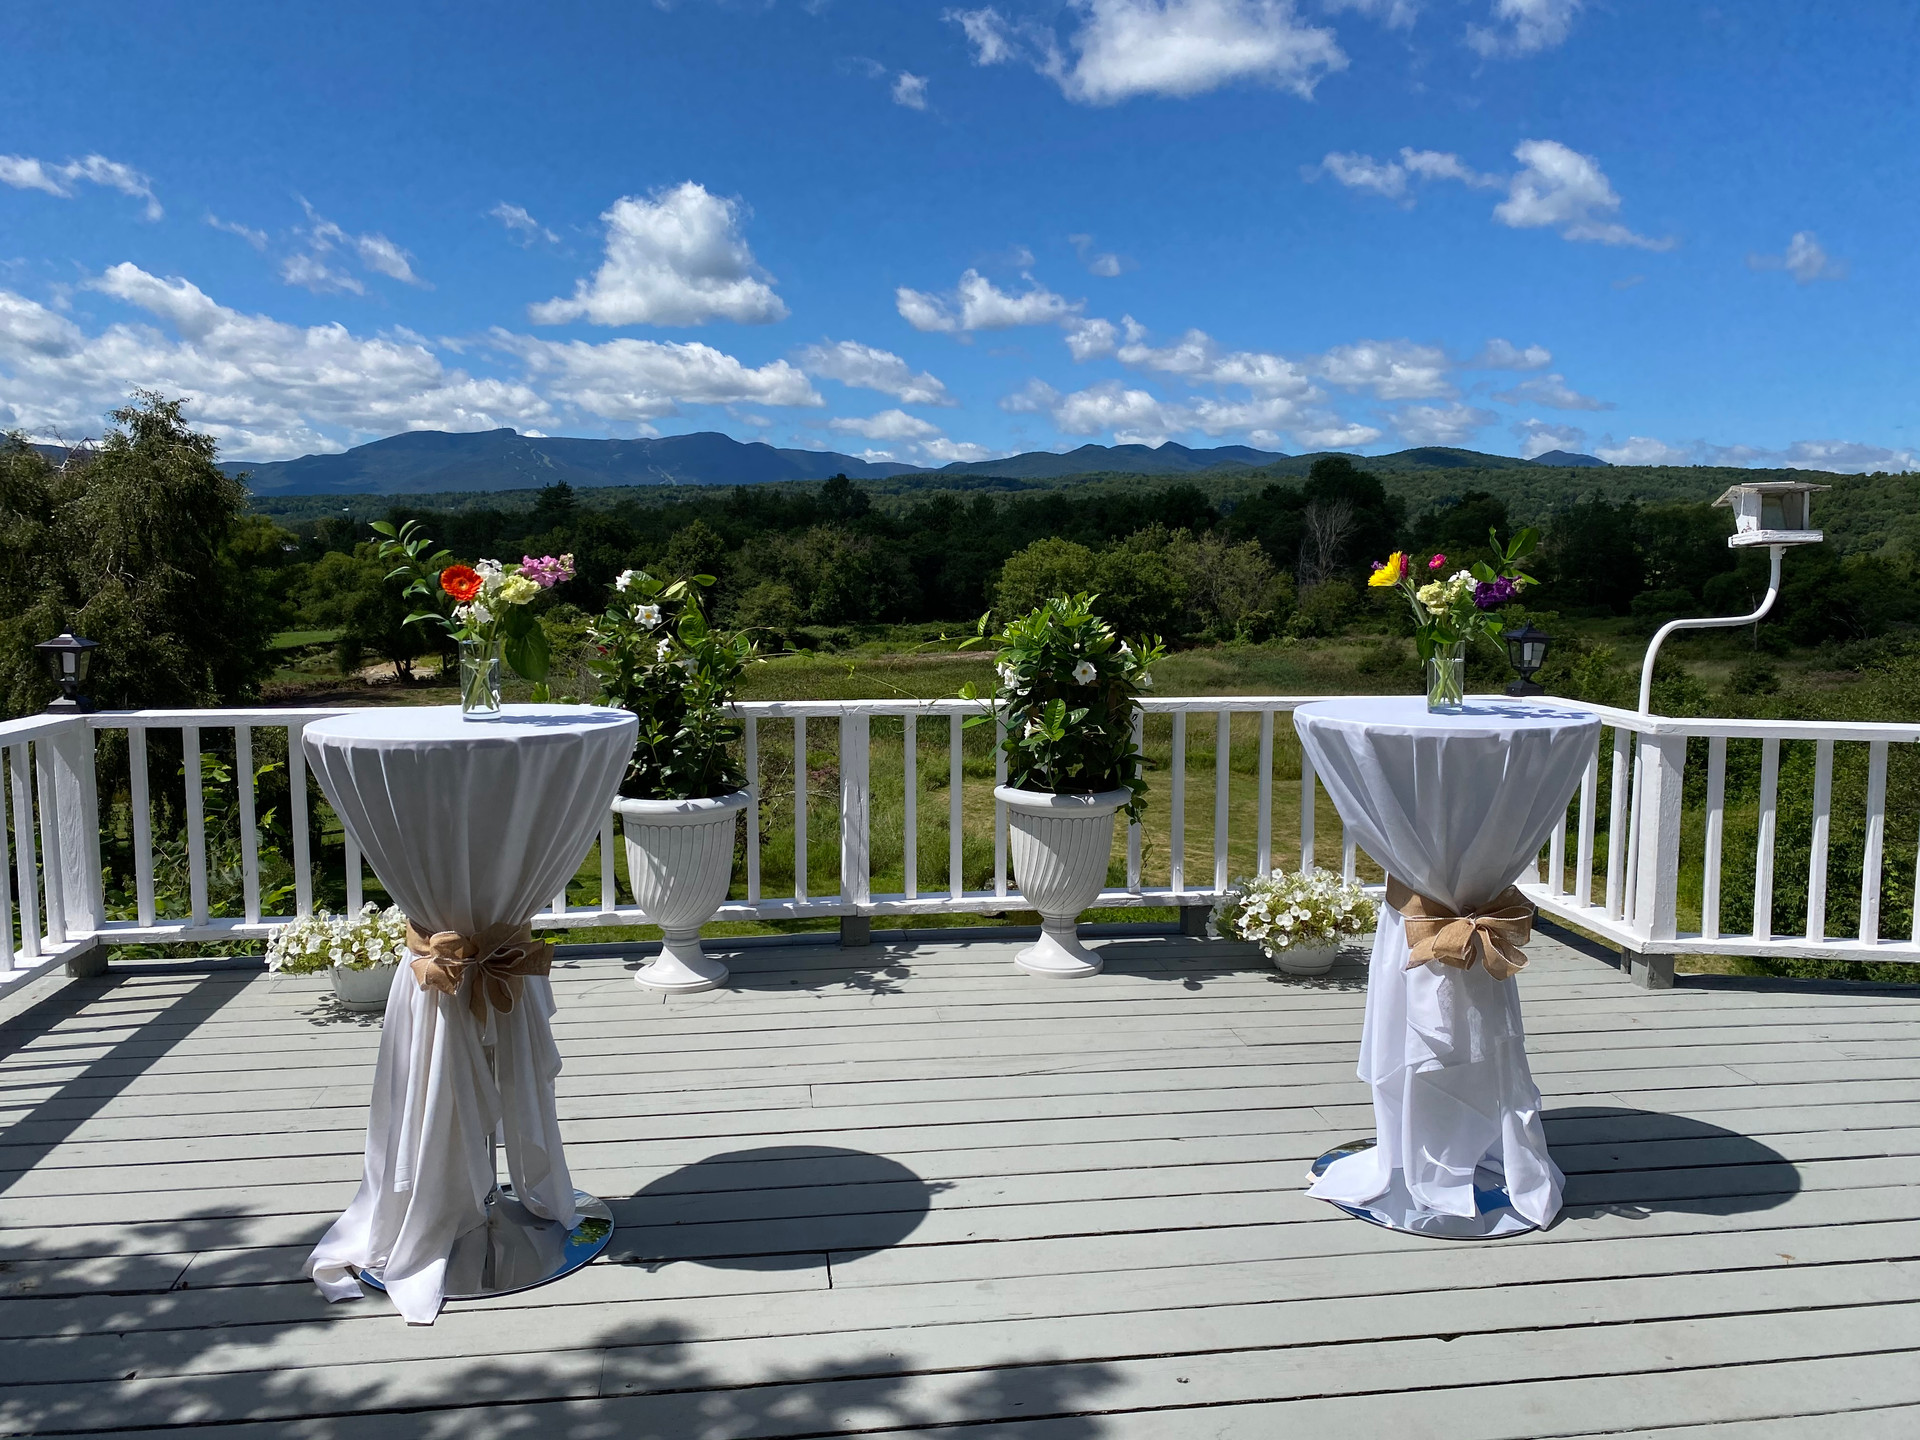 Porch for Celebrations